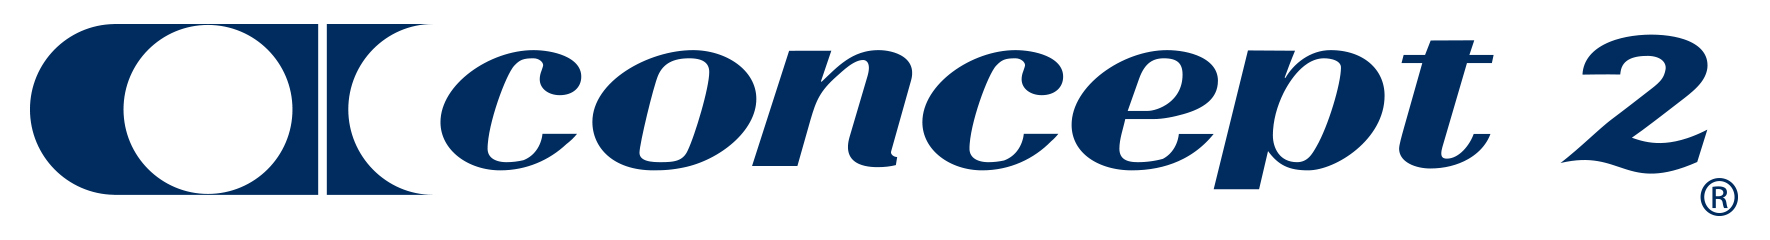 Concept2_logo_Blue.jpg